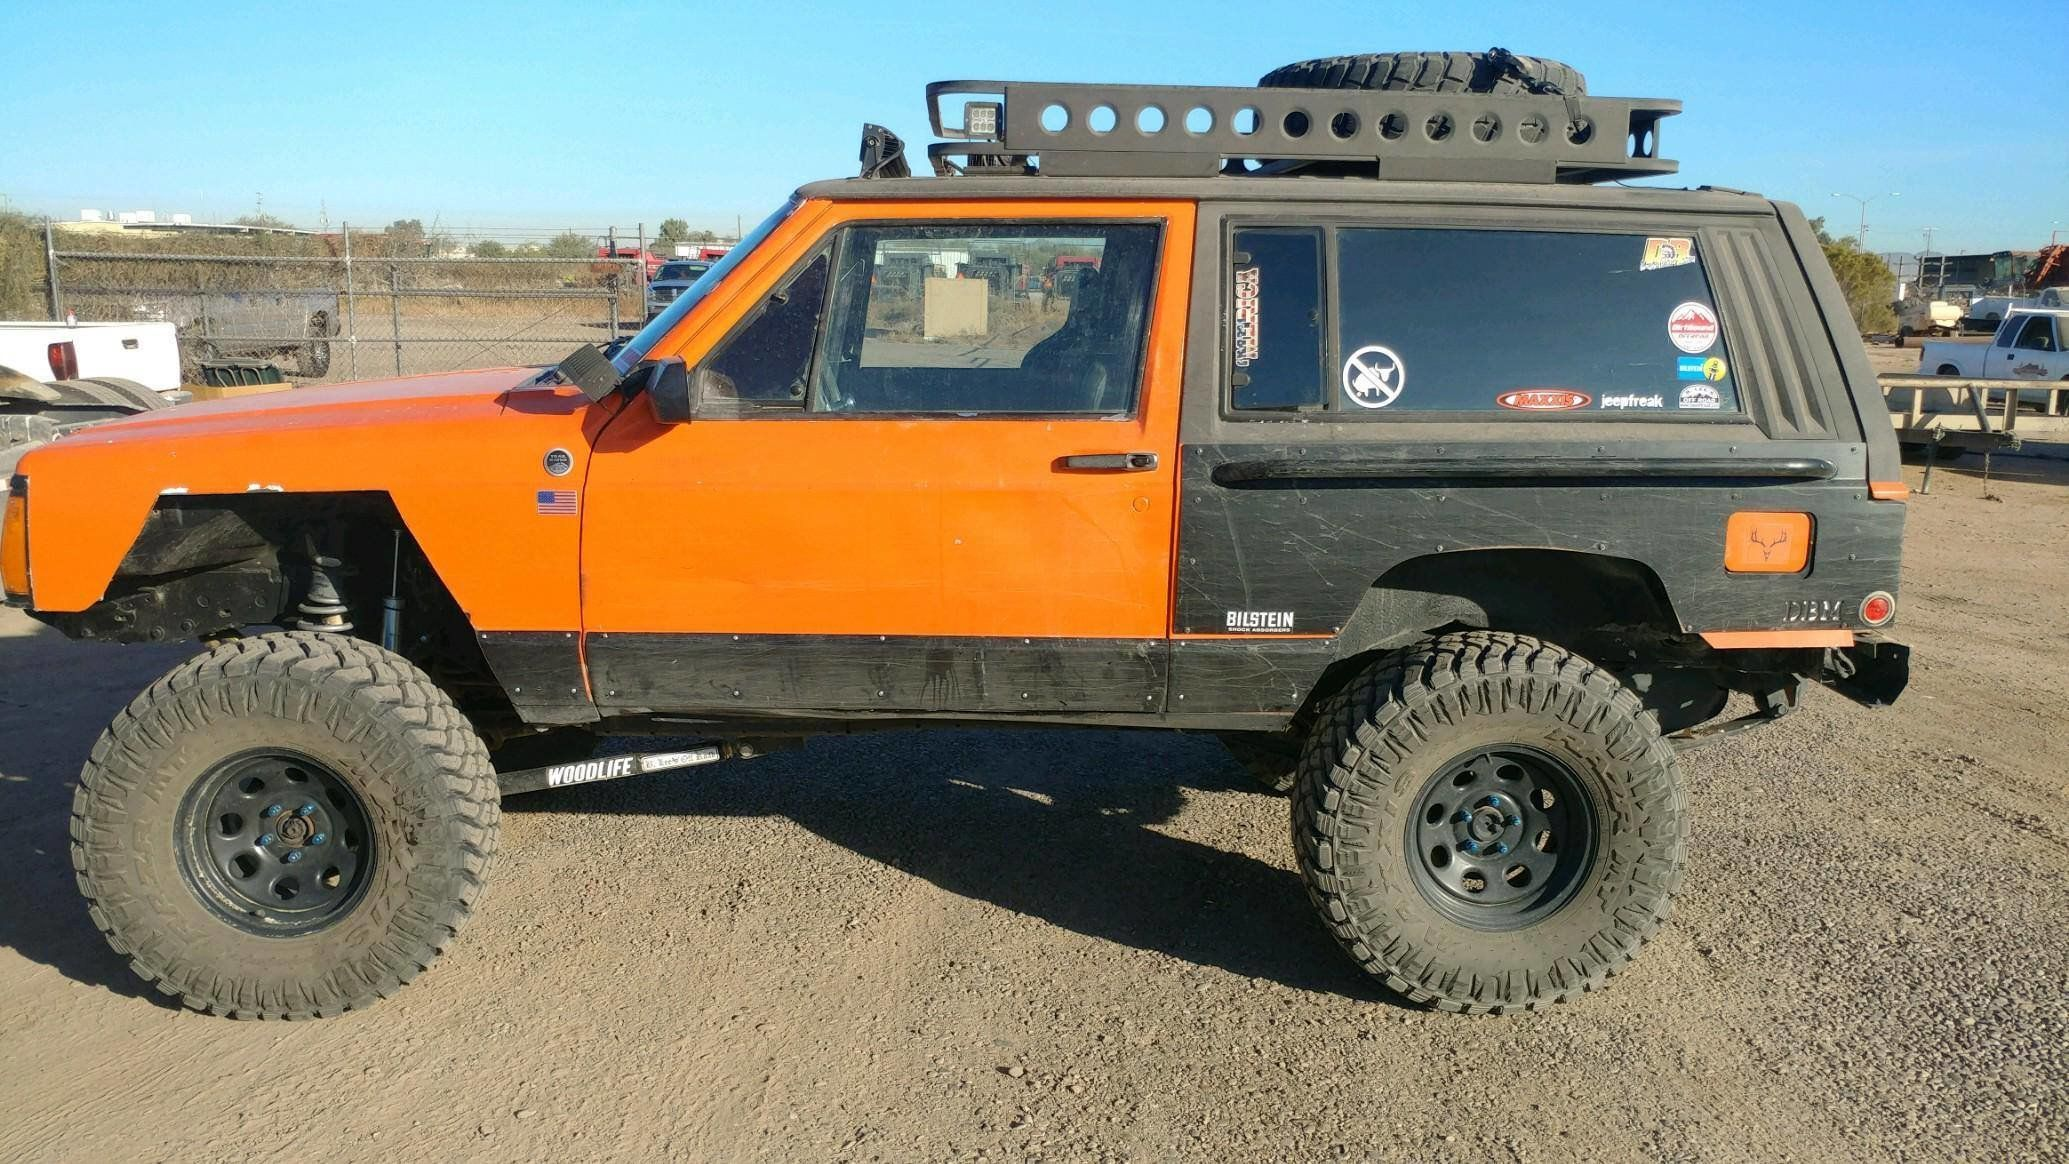 Xj 84 01 Jeep Cherokee Xj Lower Body Armor 2 4 Door Custom Trucks Jeep Cherokee Xj Jeep Xj